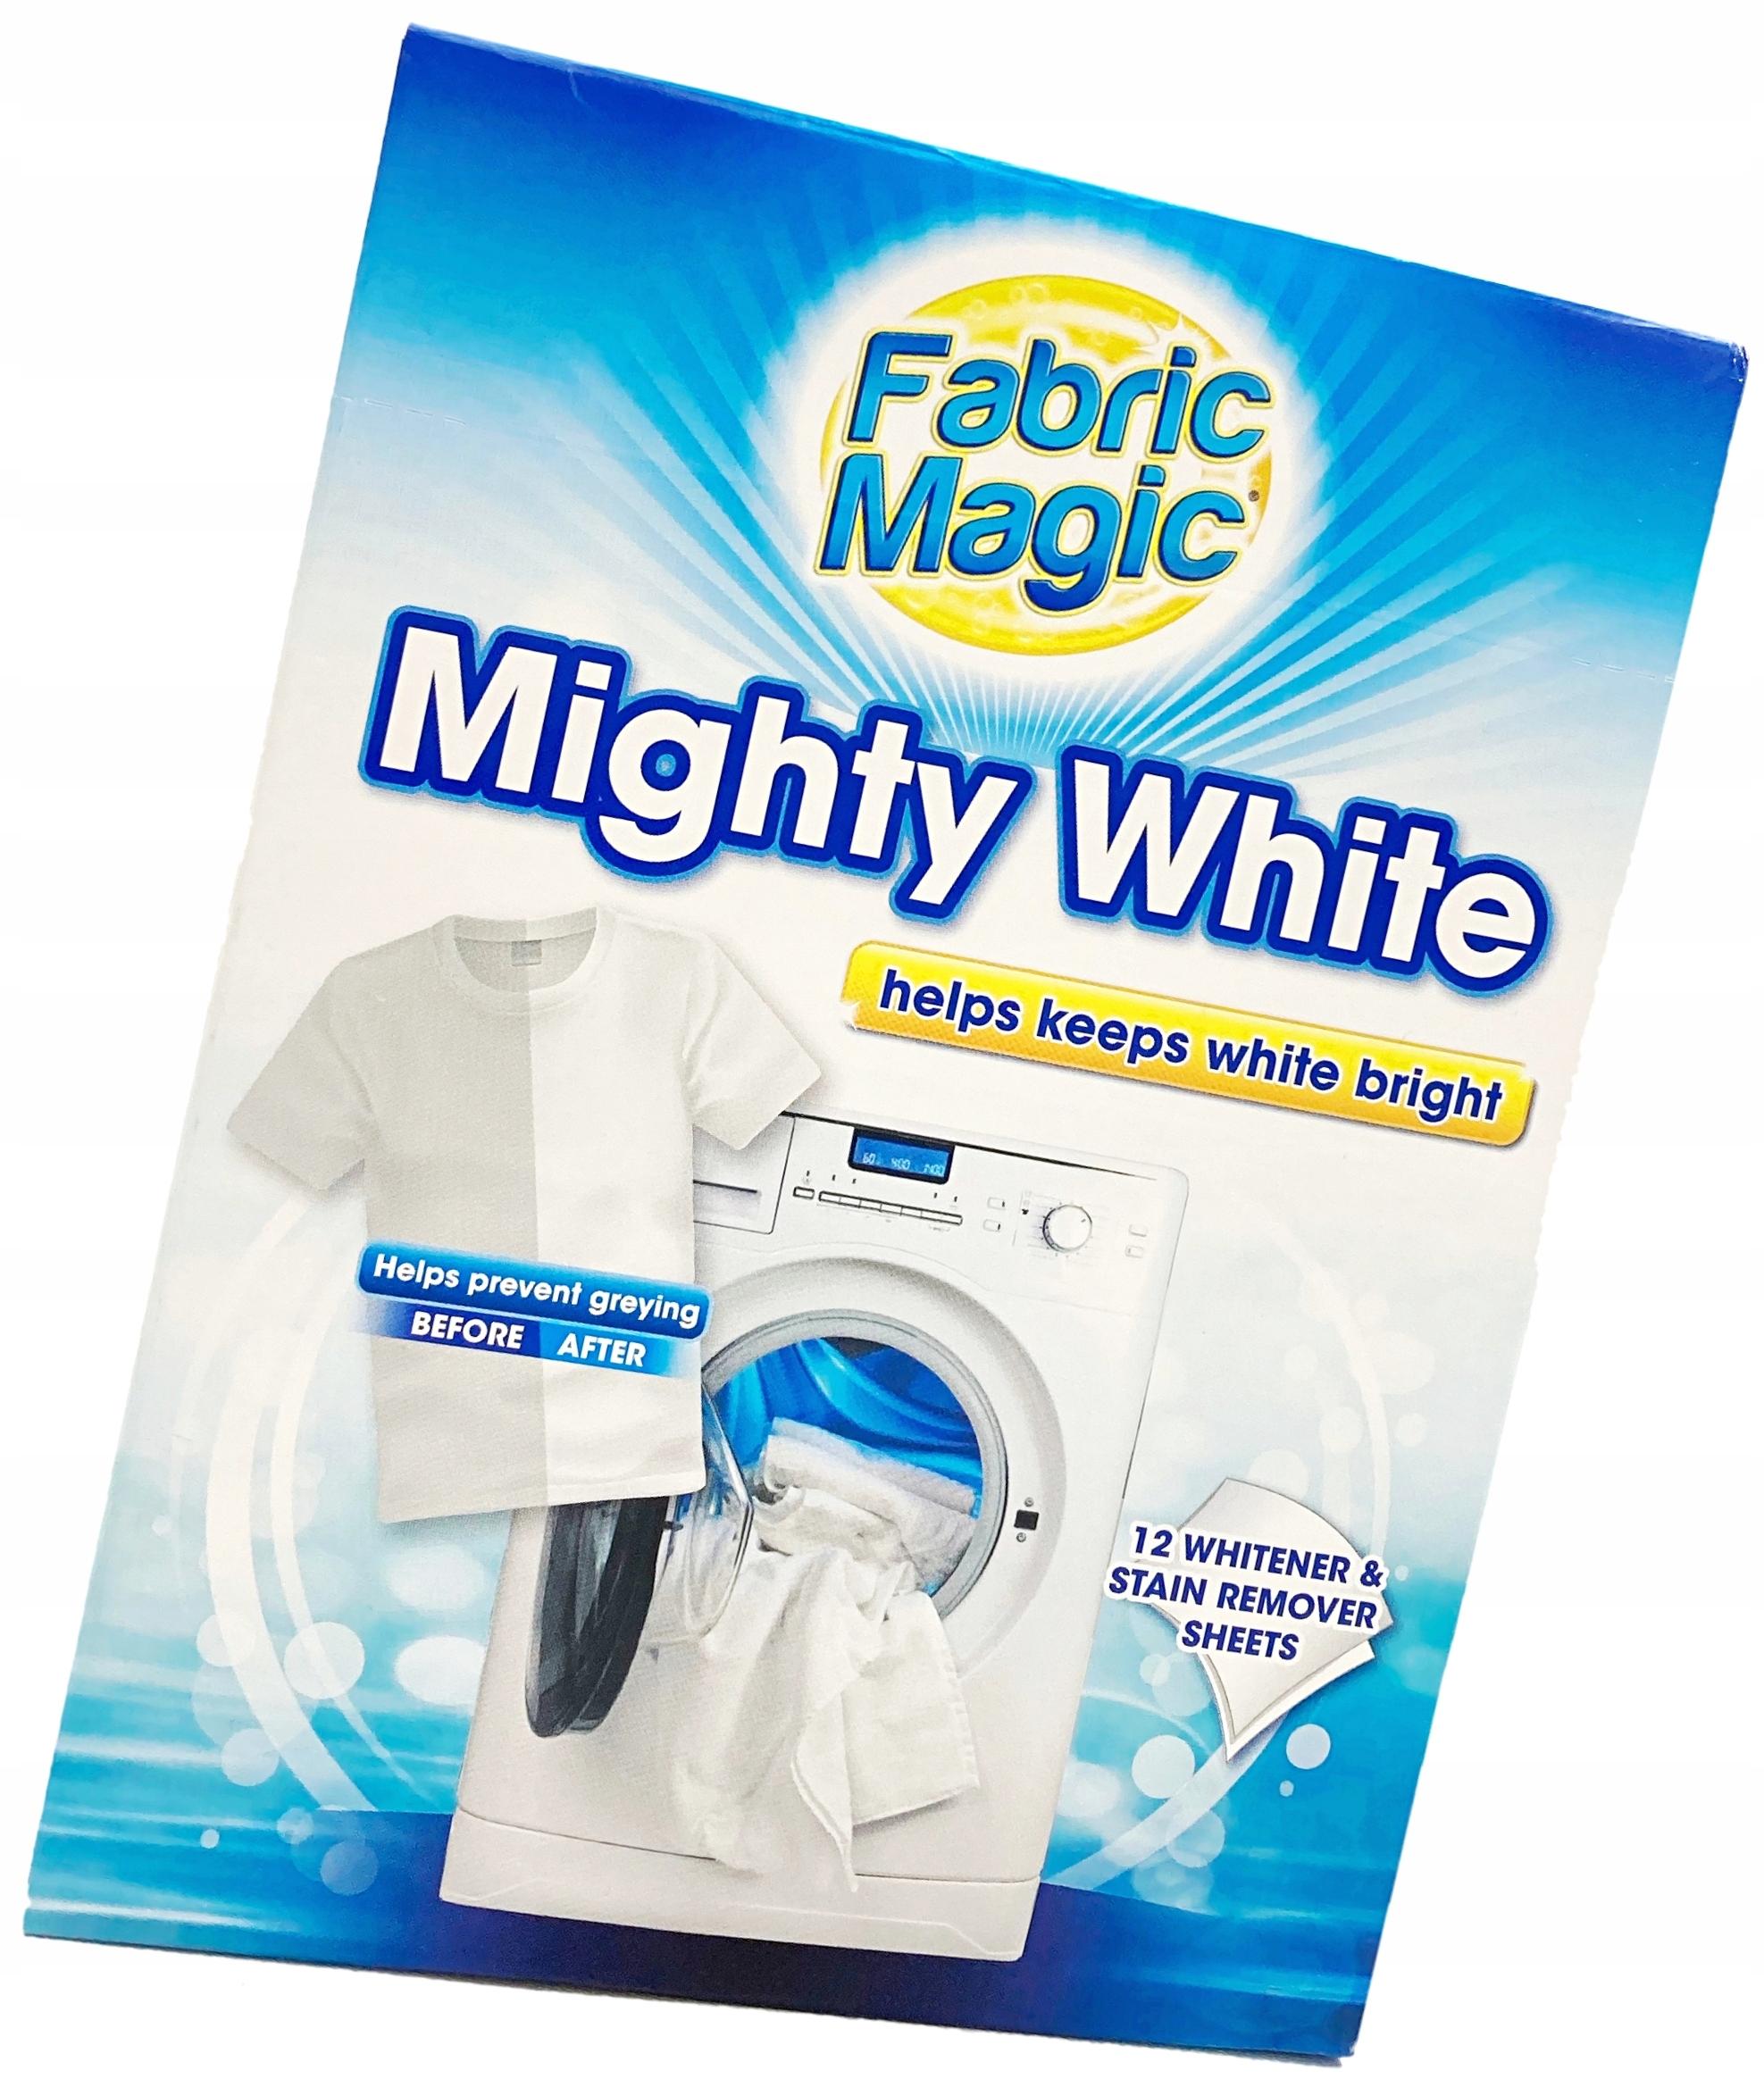 FABRIC MAGIC WHITE СТИРКИ